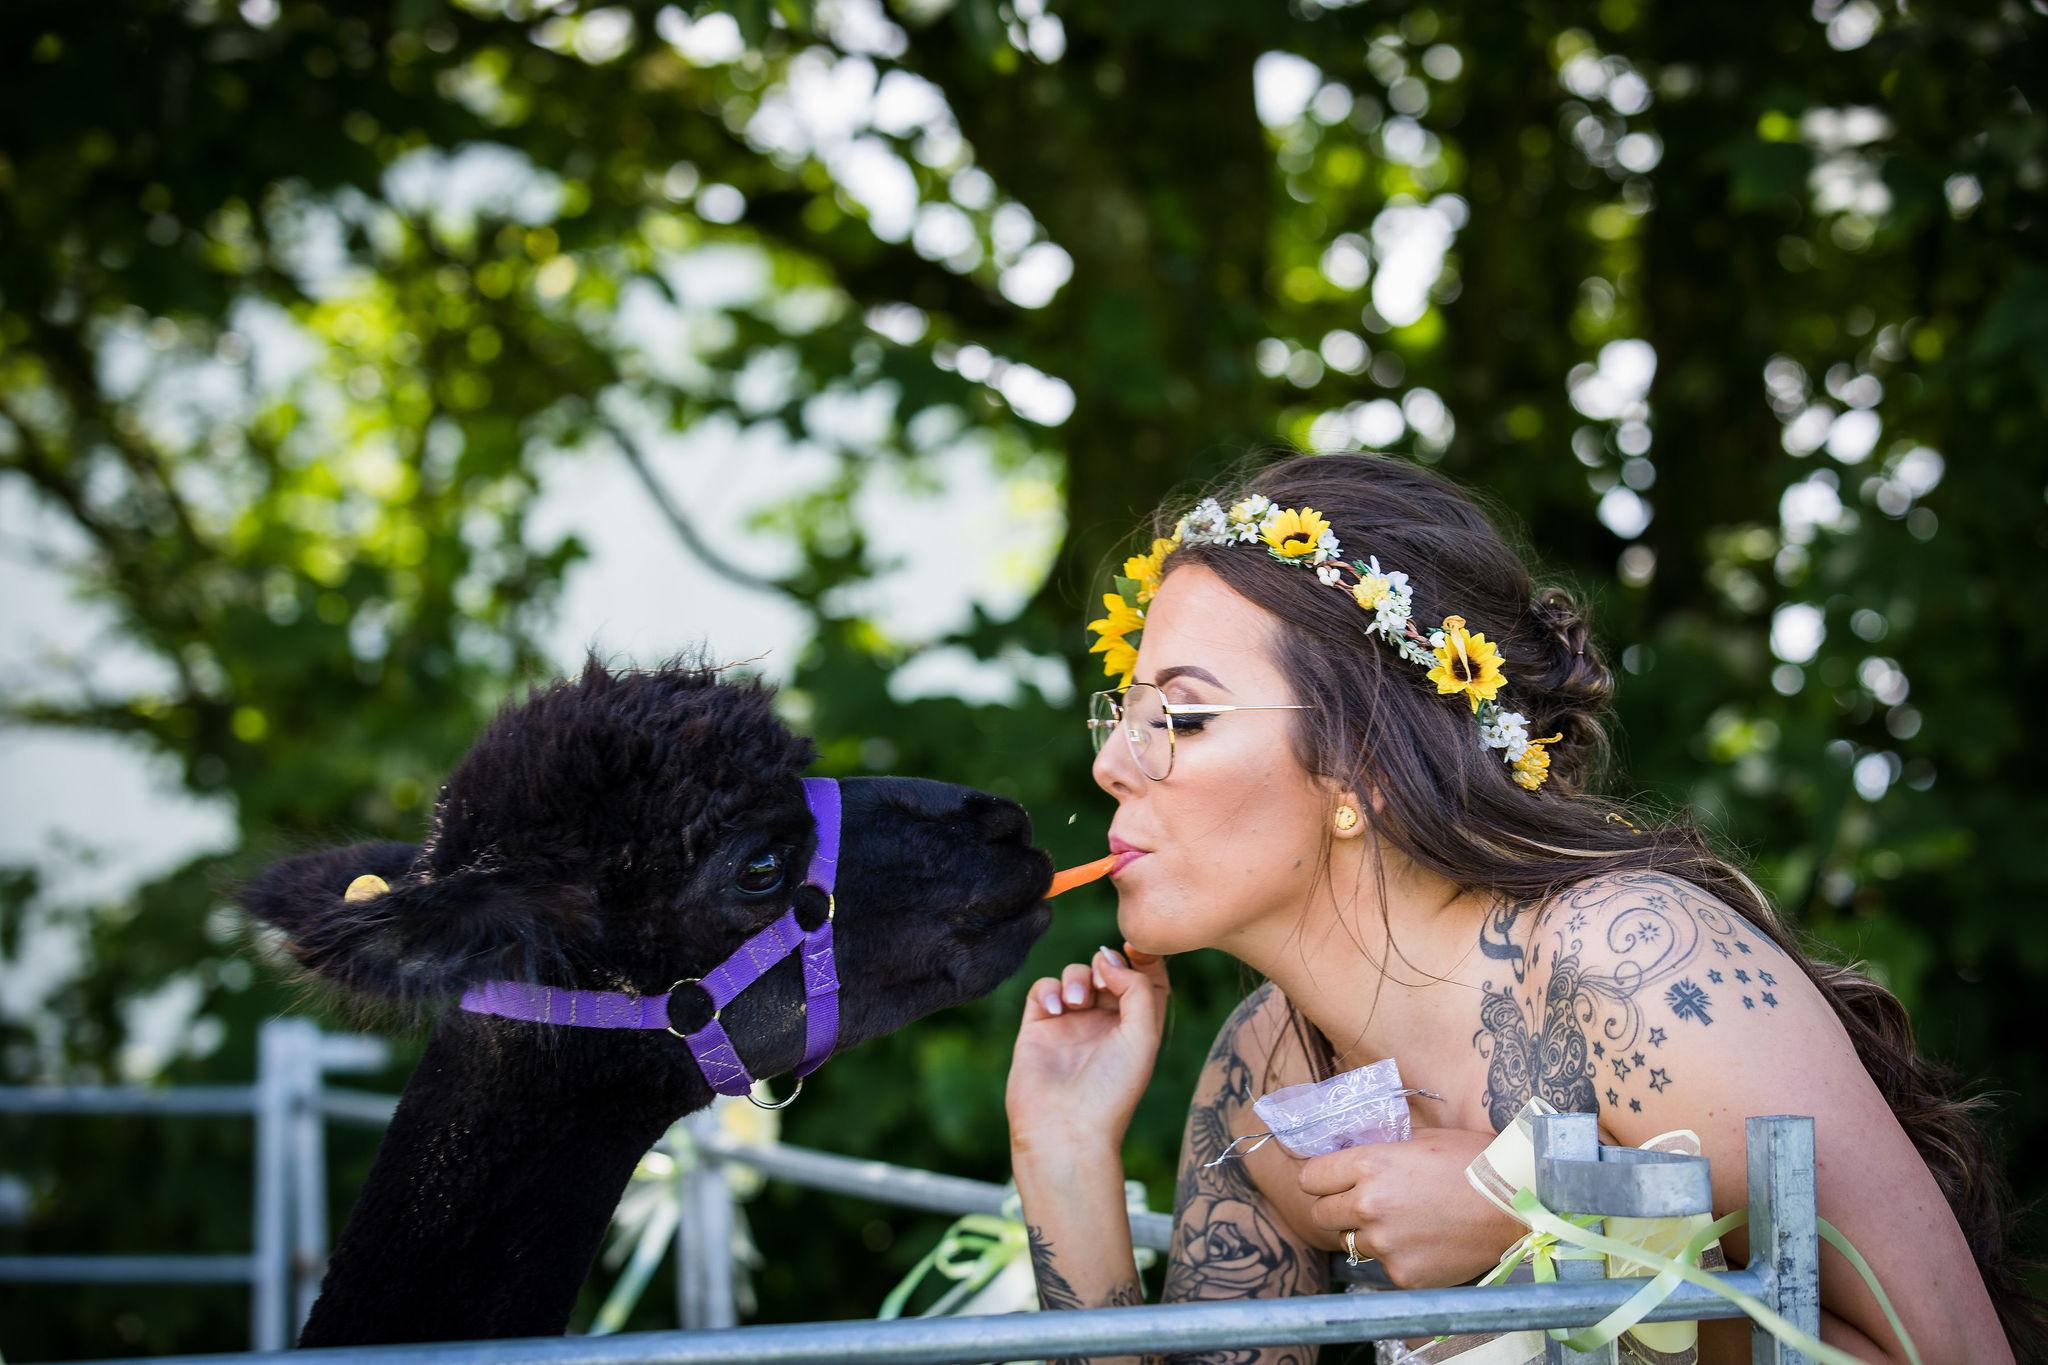 Harriet&Rhys Wedding - Magical sunflower wedding - wedding alpacas with bride